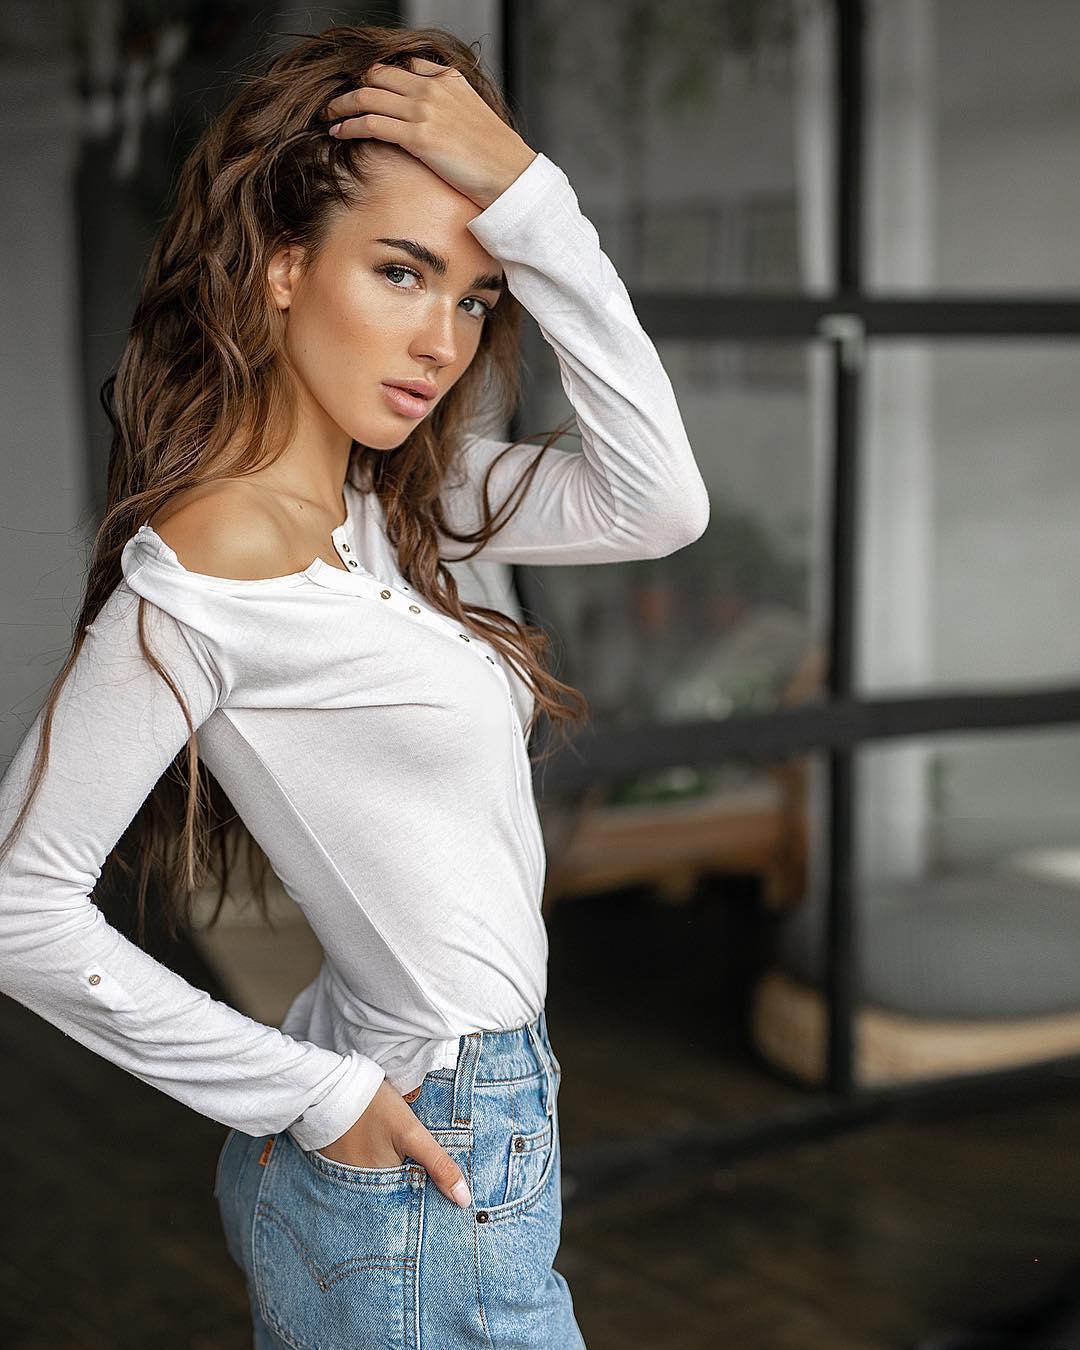 Yekaterina-Mezenova-Wallpapers-Insta-Fit-Bio-4